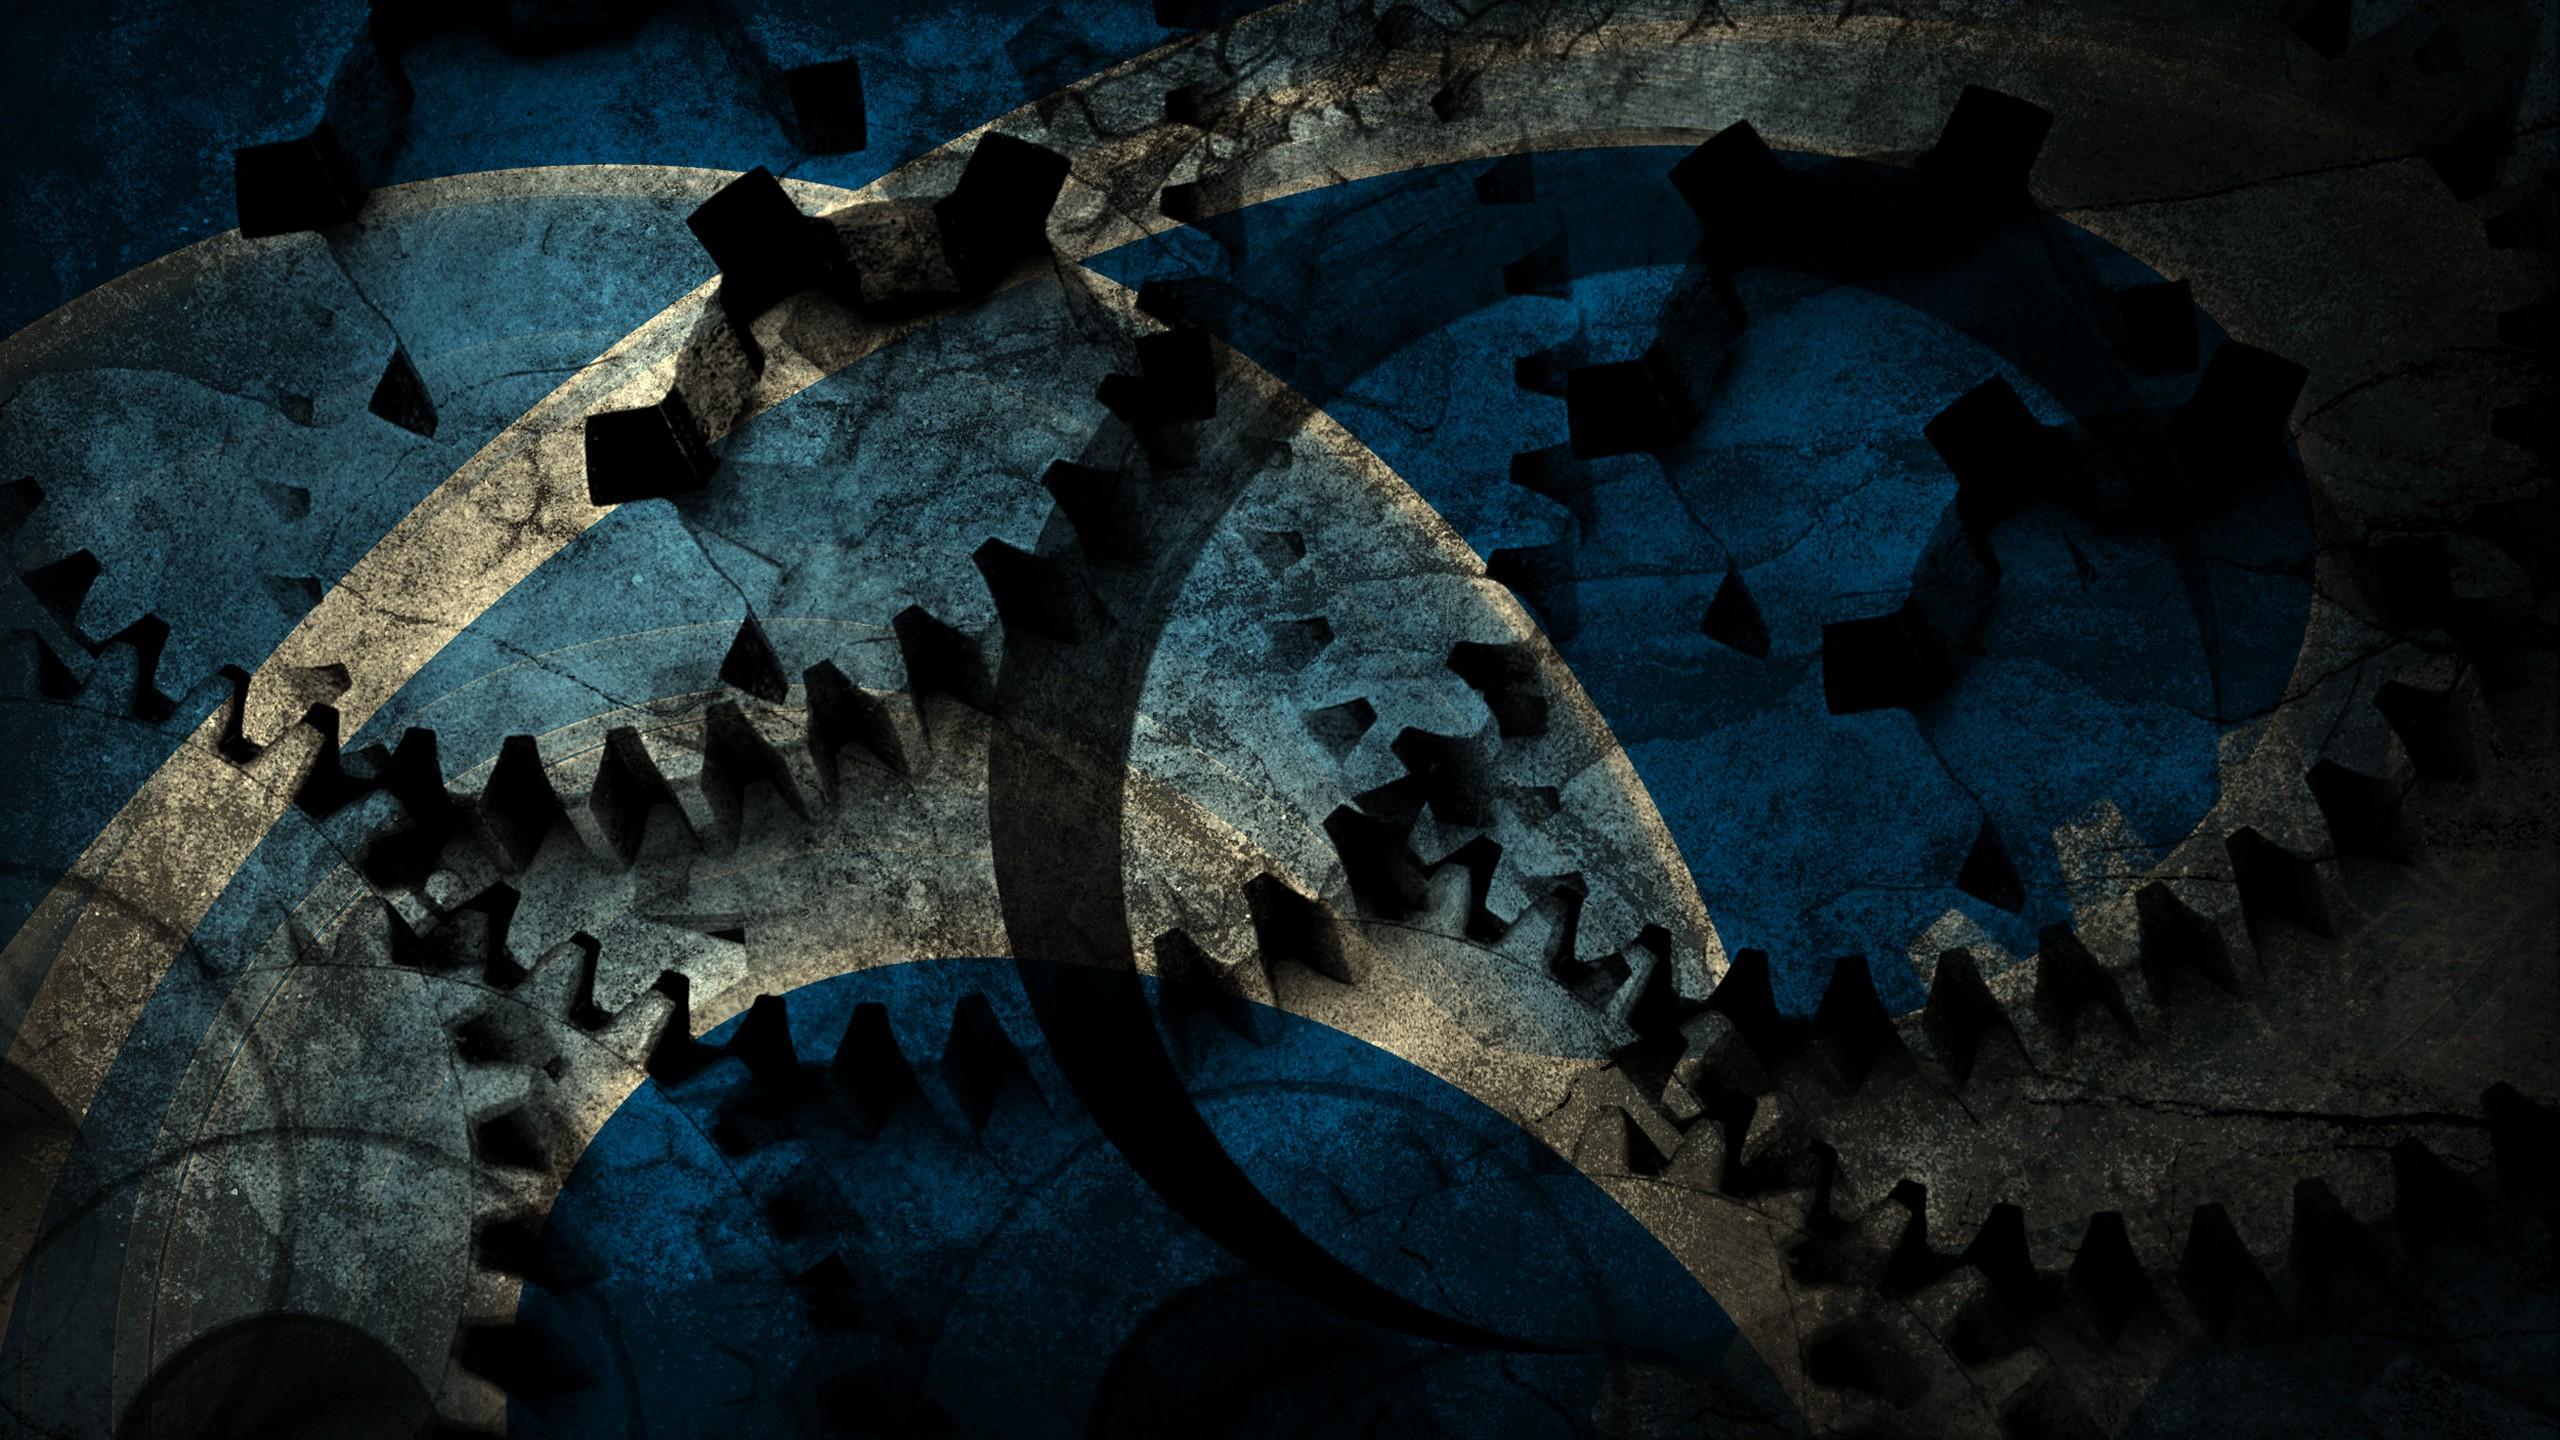 General 2560x1440 gears machine abstract grunge blue